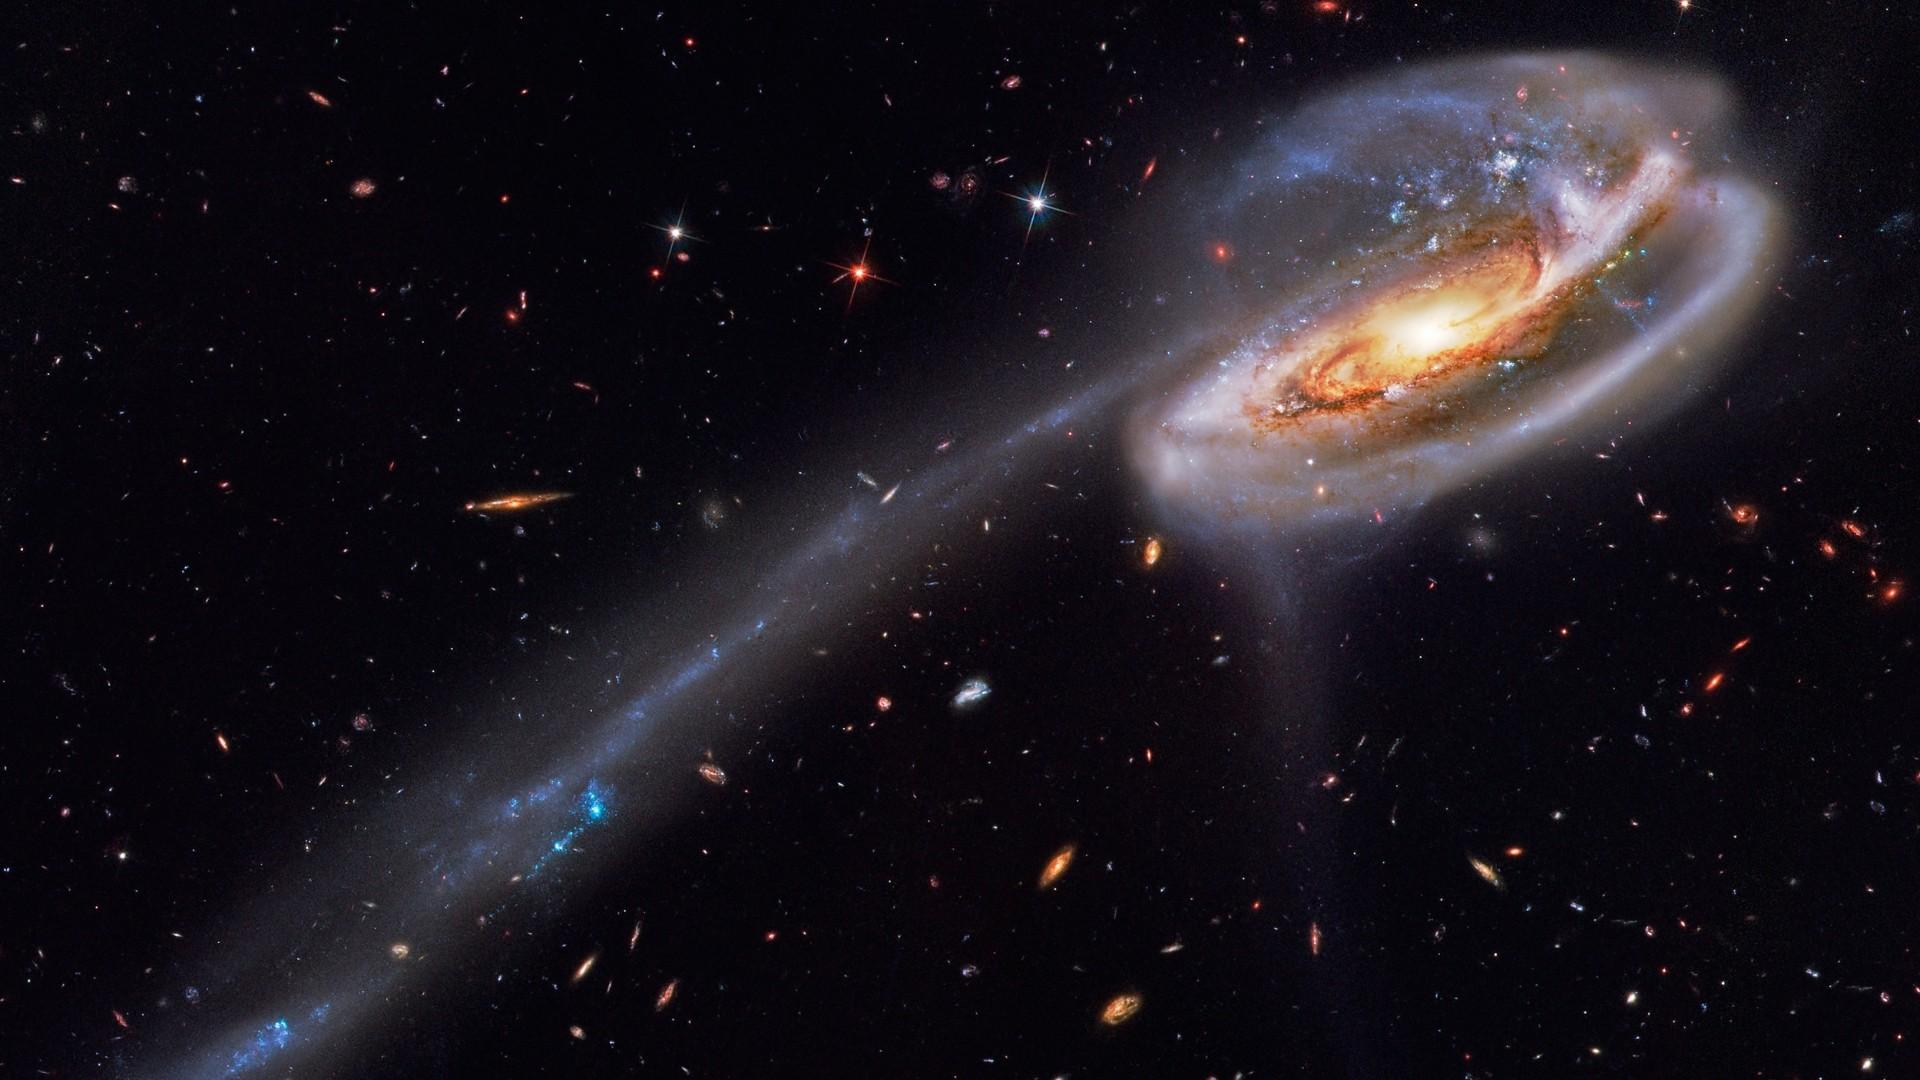 Download Wallpaper 1920x1080 Nebula Space Stars Sky Full HD 1080p